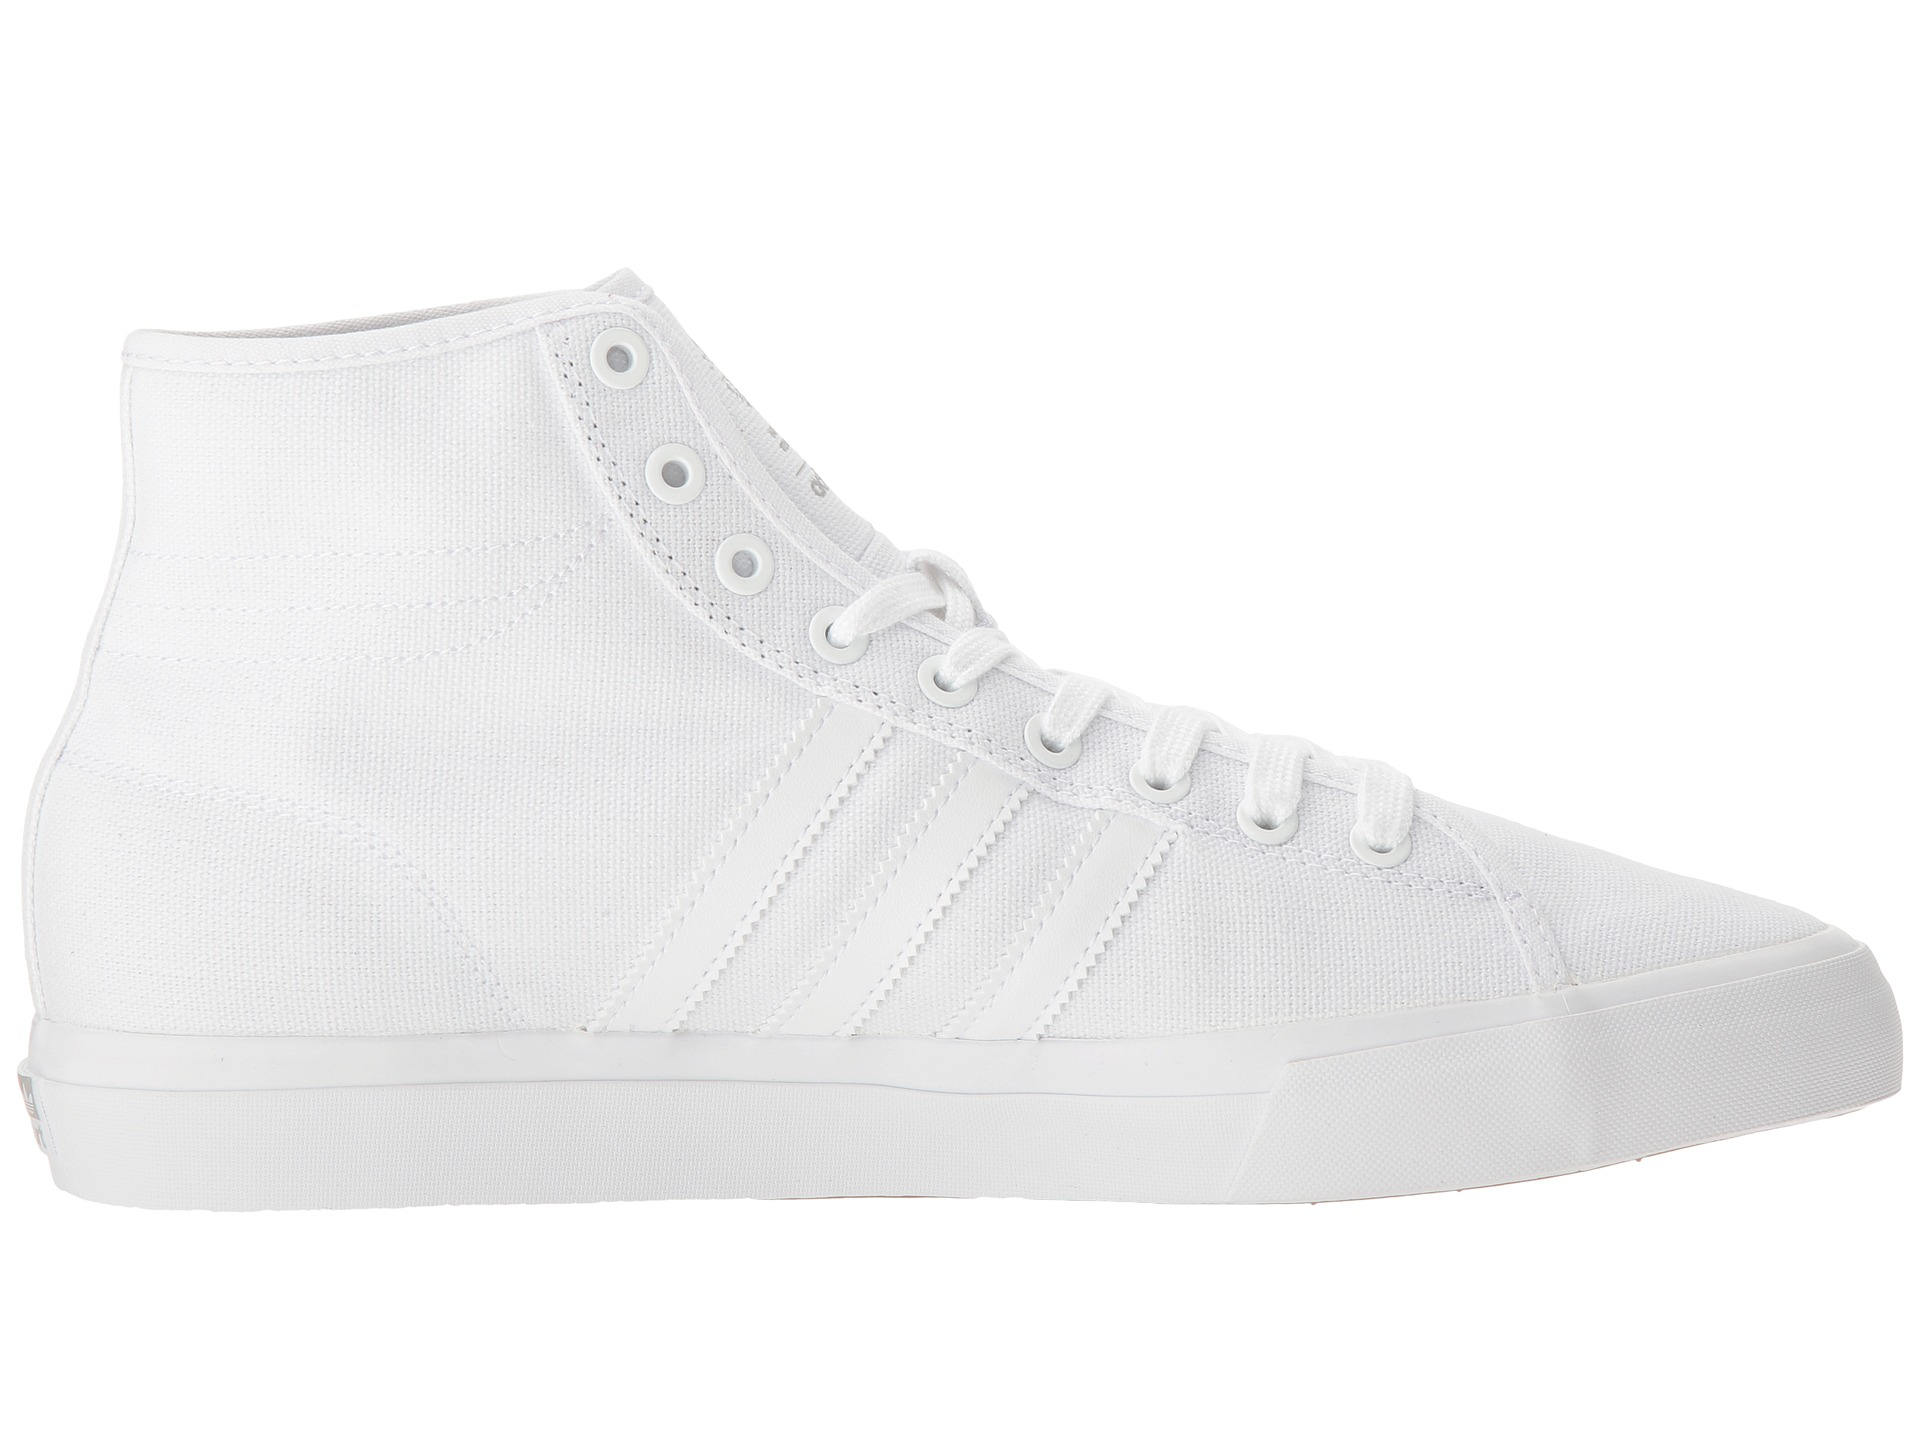 Adidas Men S Matchcourt Mid X Welcome Skate Shoe